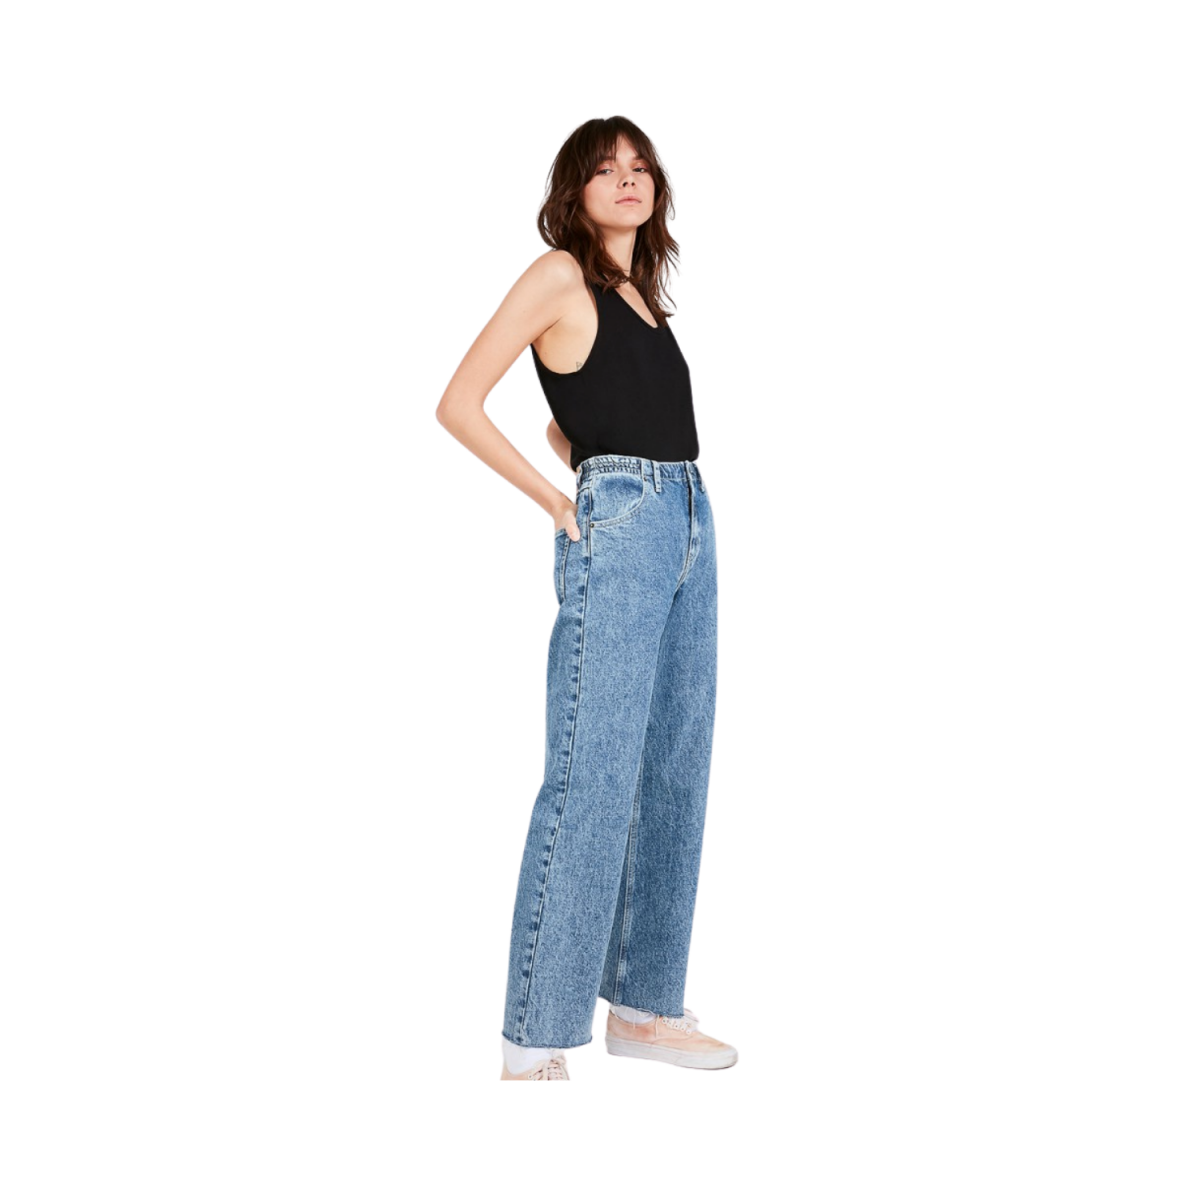 jacksonville strop - noir t-shirt - model billede